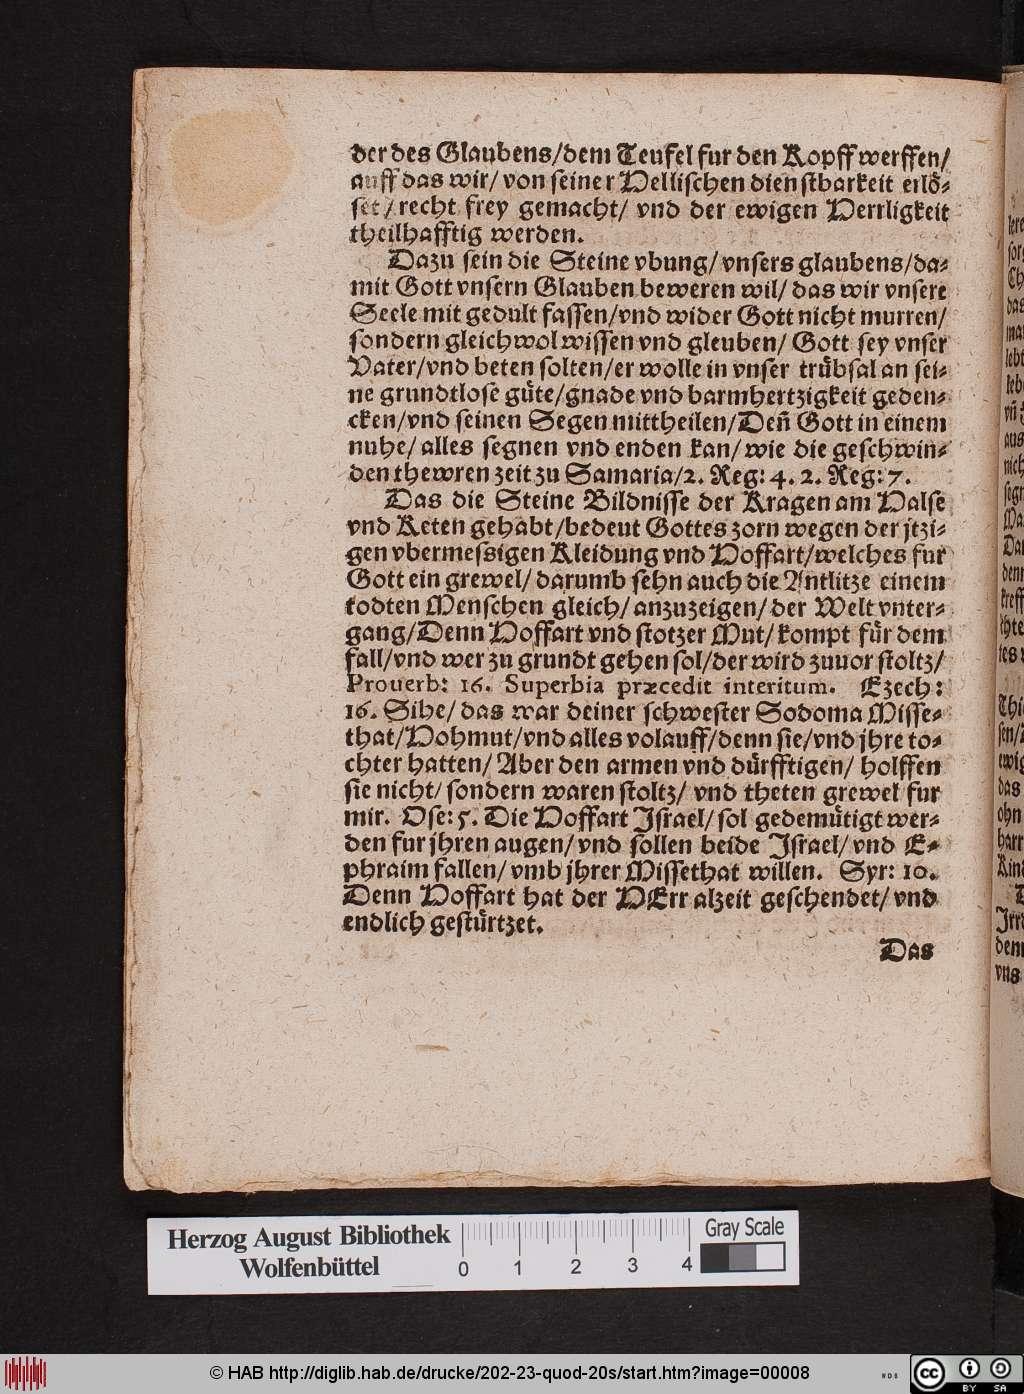 http://diglib.hab.de/drucke/202-23-quod-20s/00008.jpg